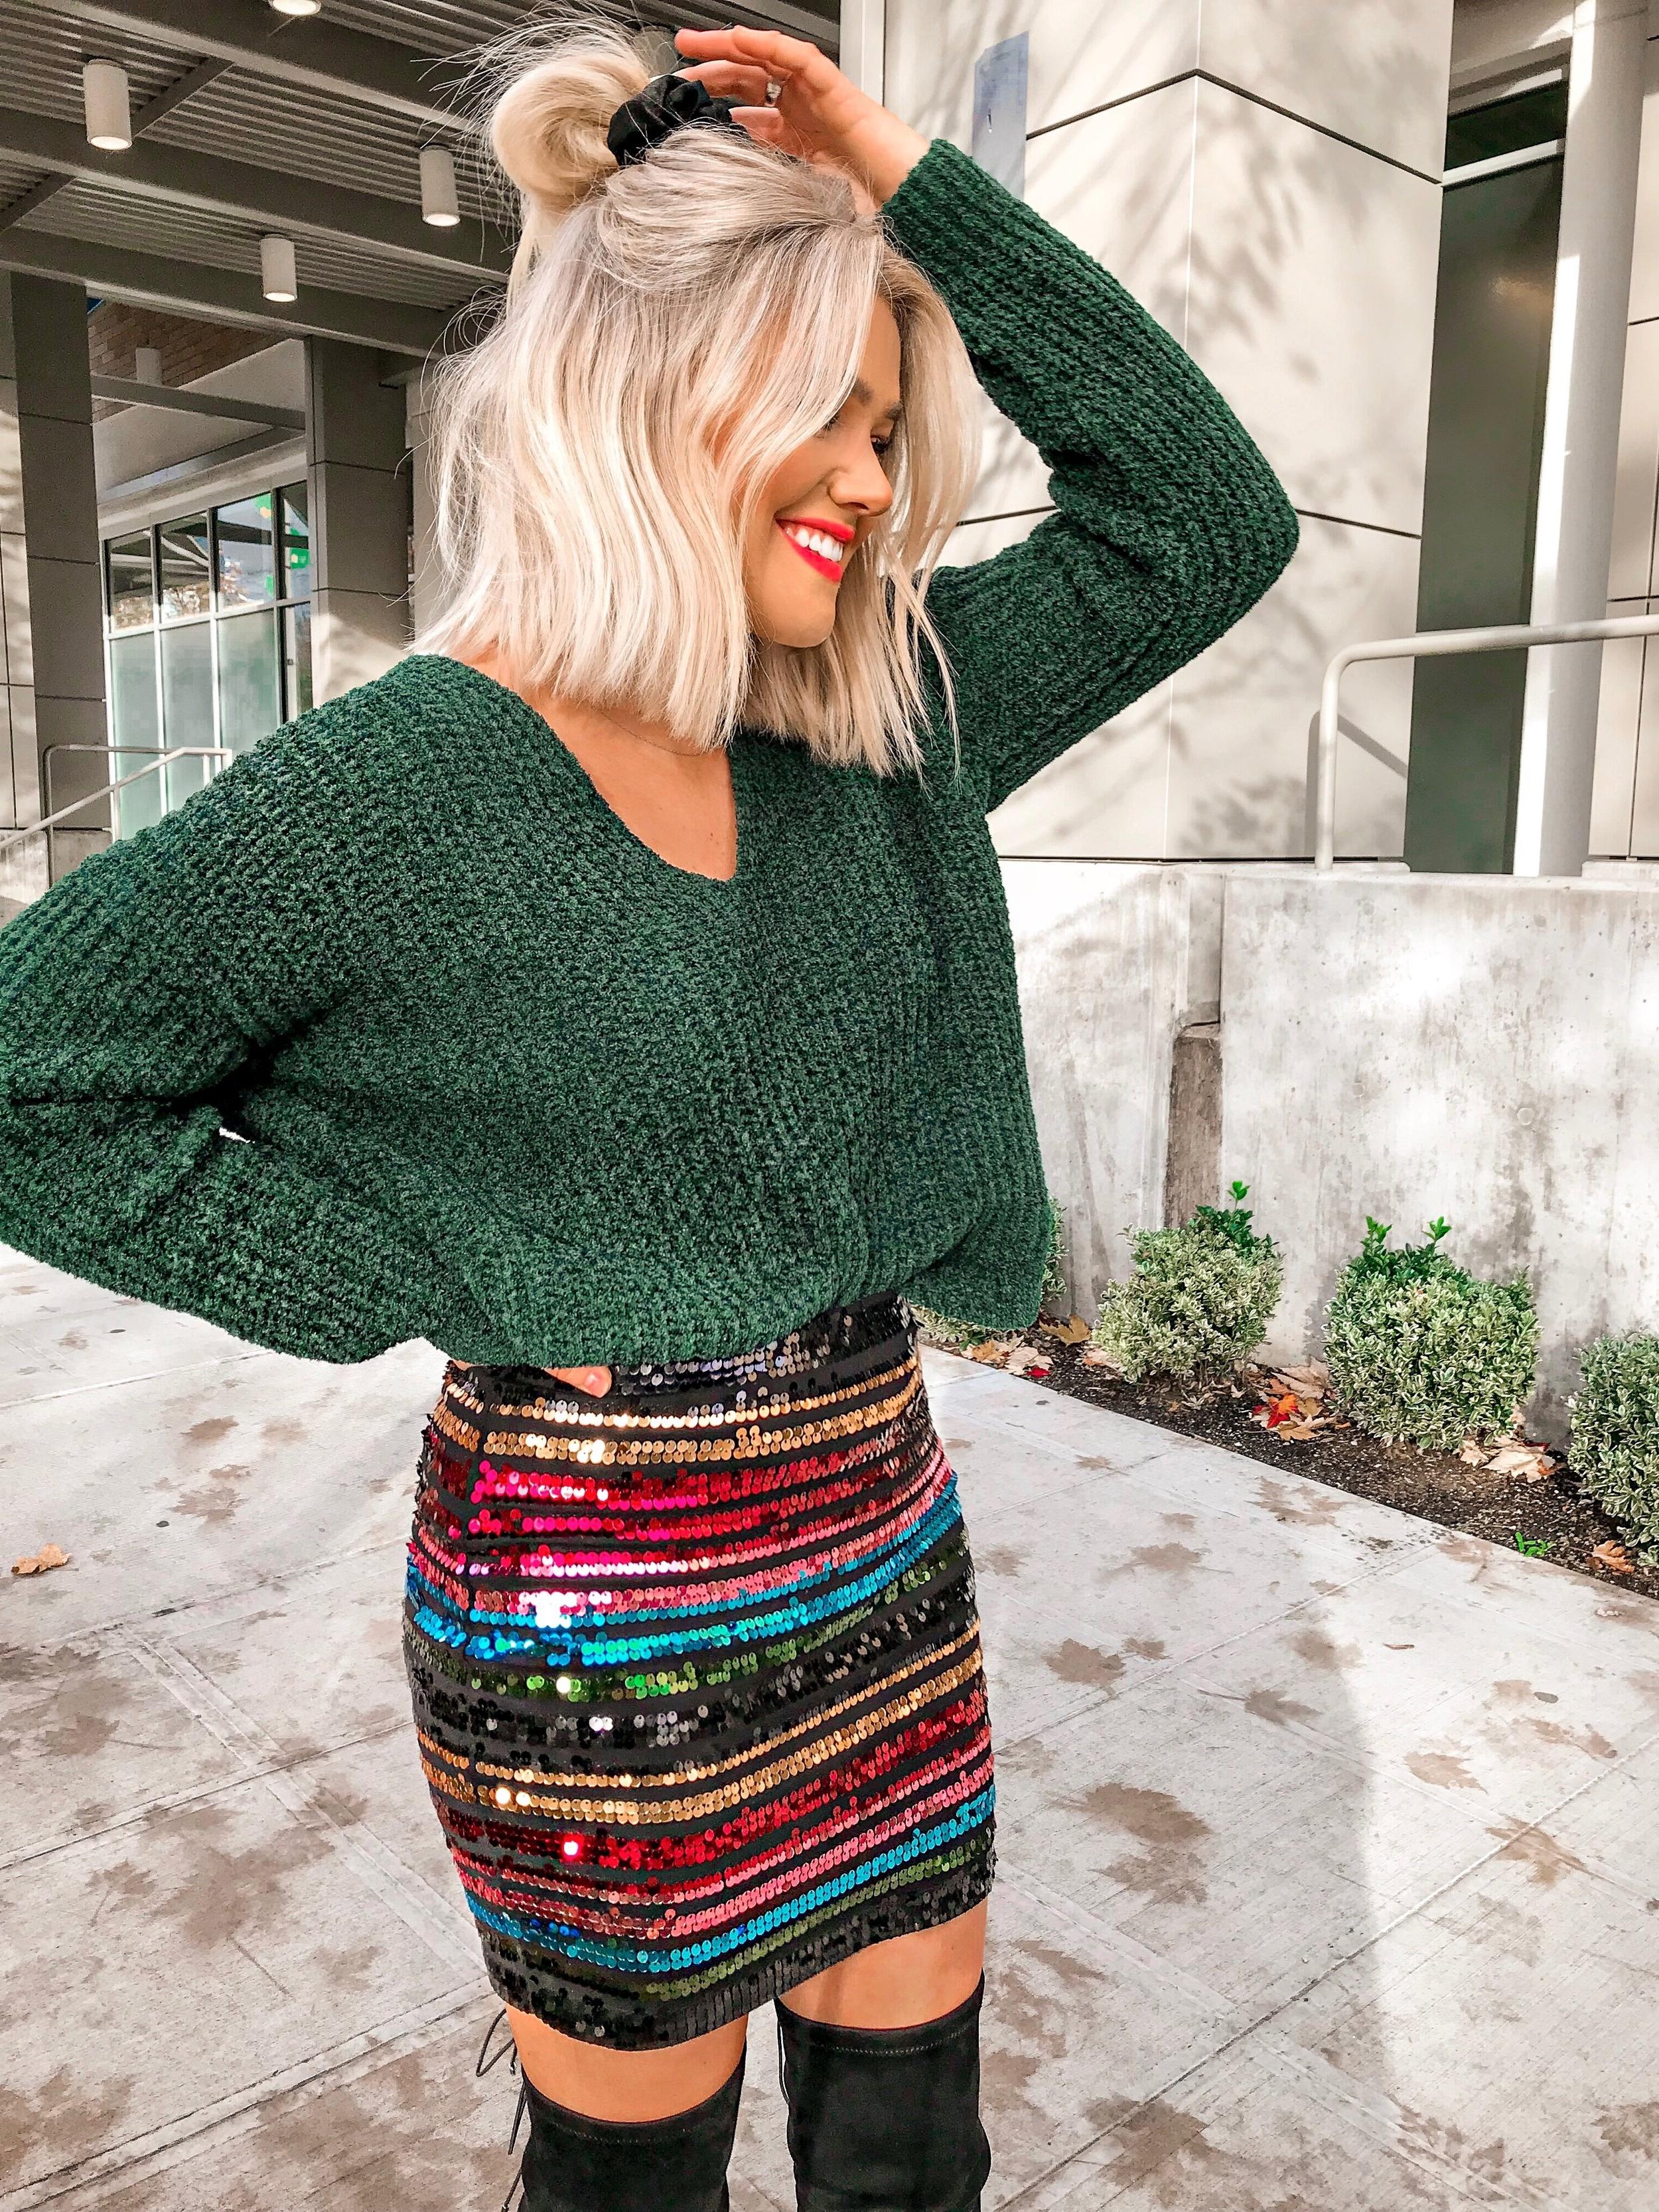 Bre Sheppard - Espress Holiday Style : Shimmer Skirt .JPG